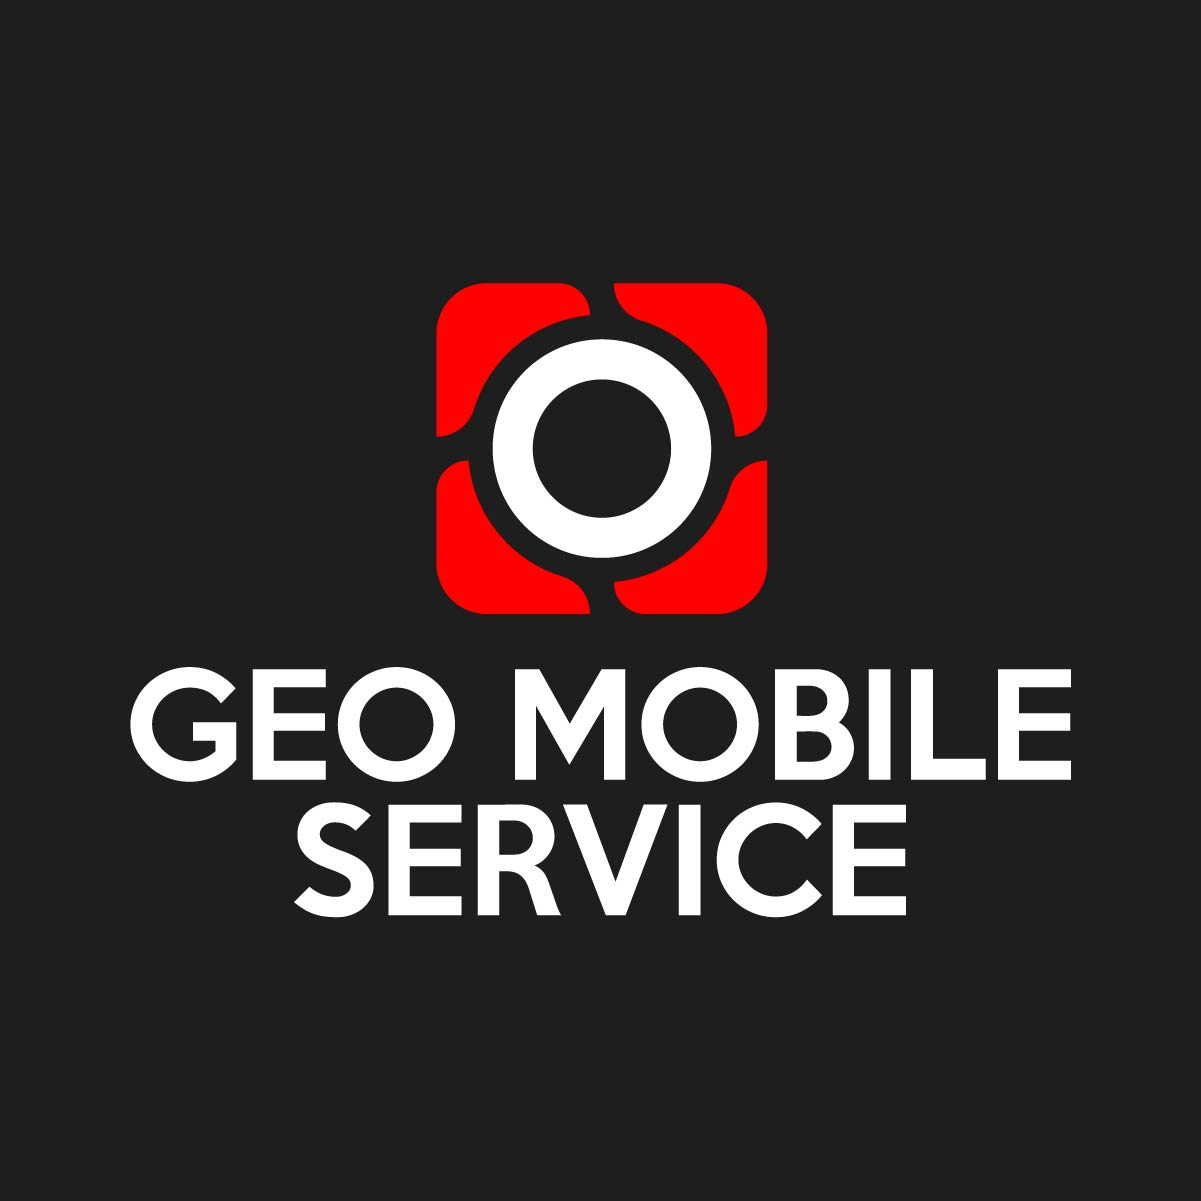 Geo Mobile Service